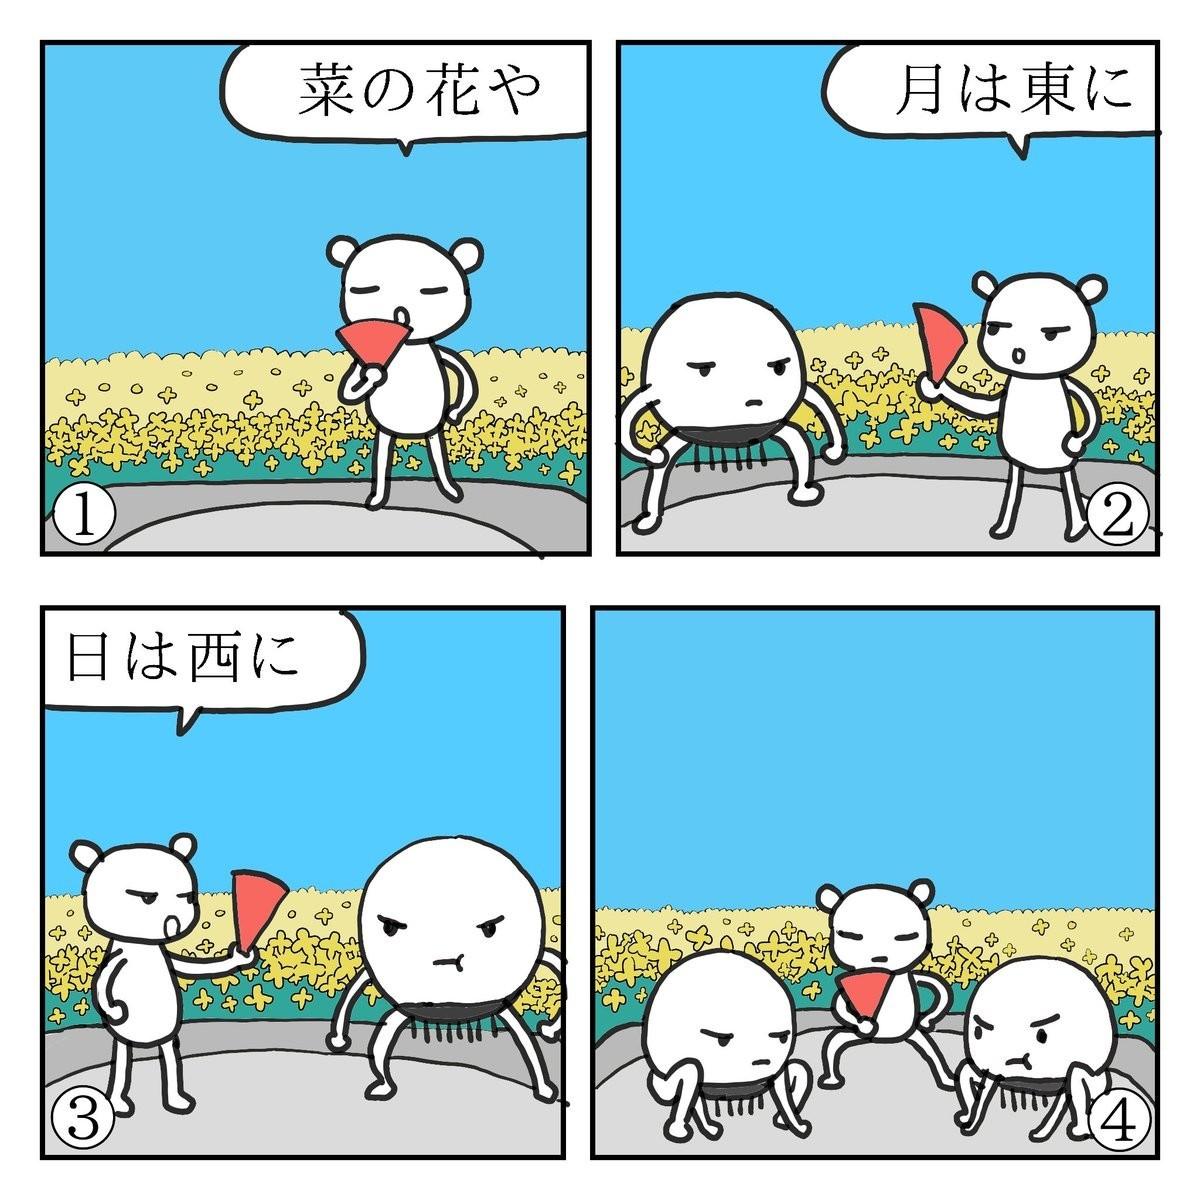 f:id:kanarihikokuma:20190315083149j:image:w330